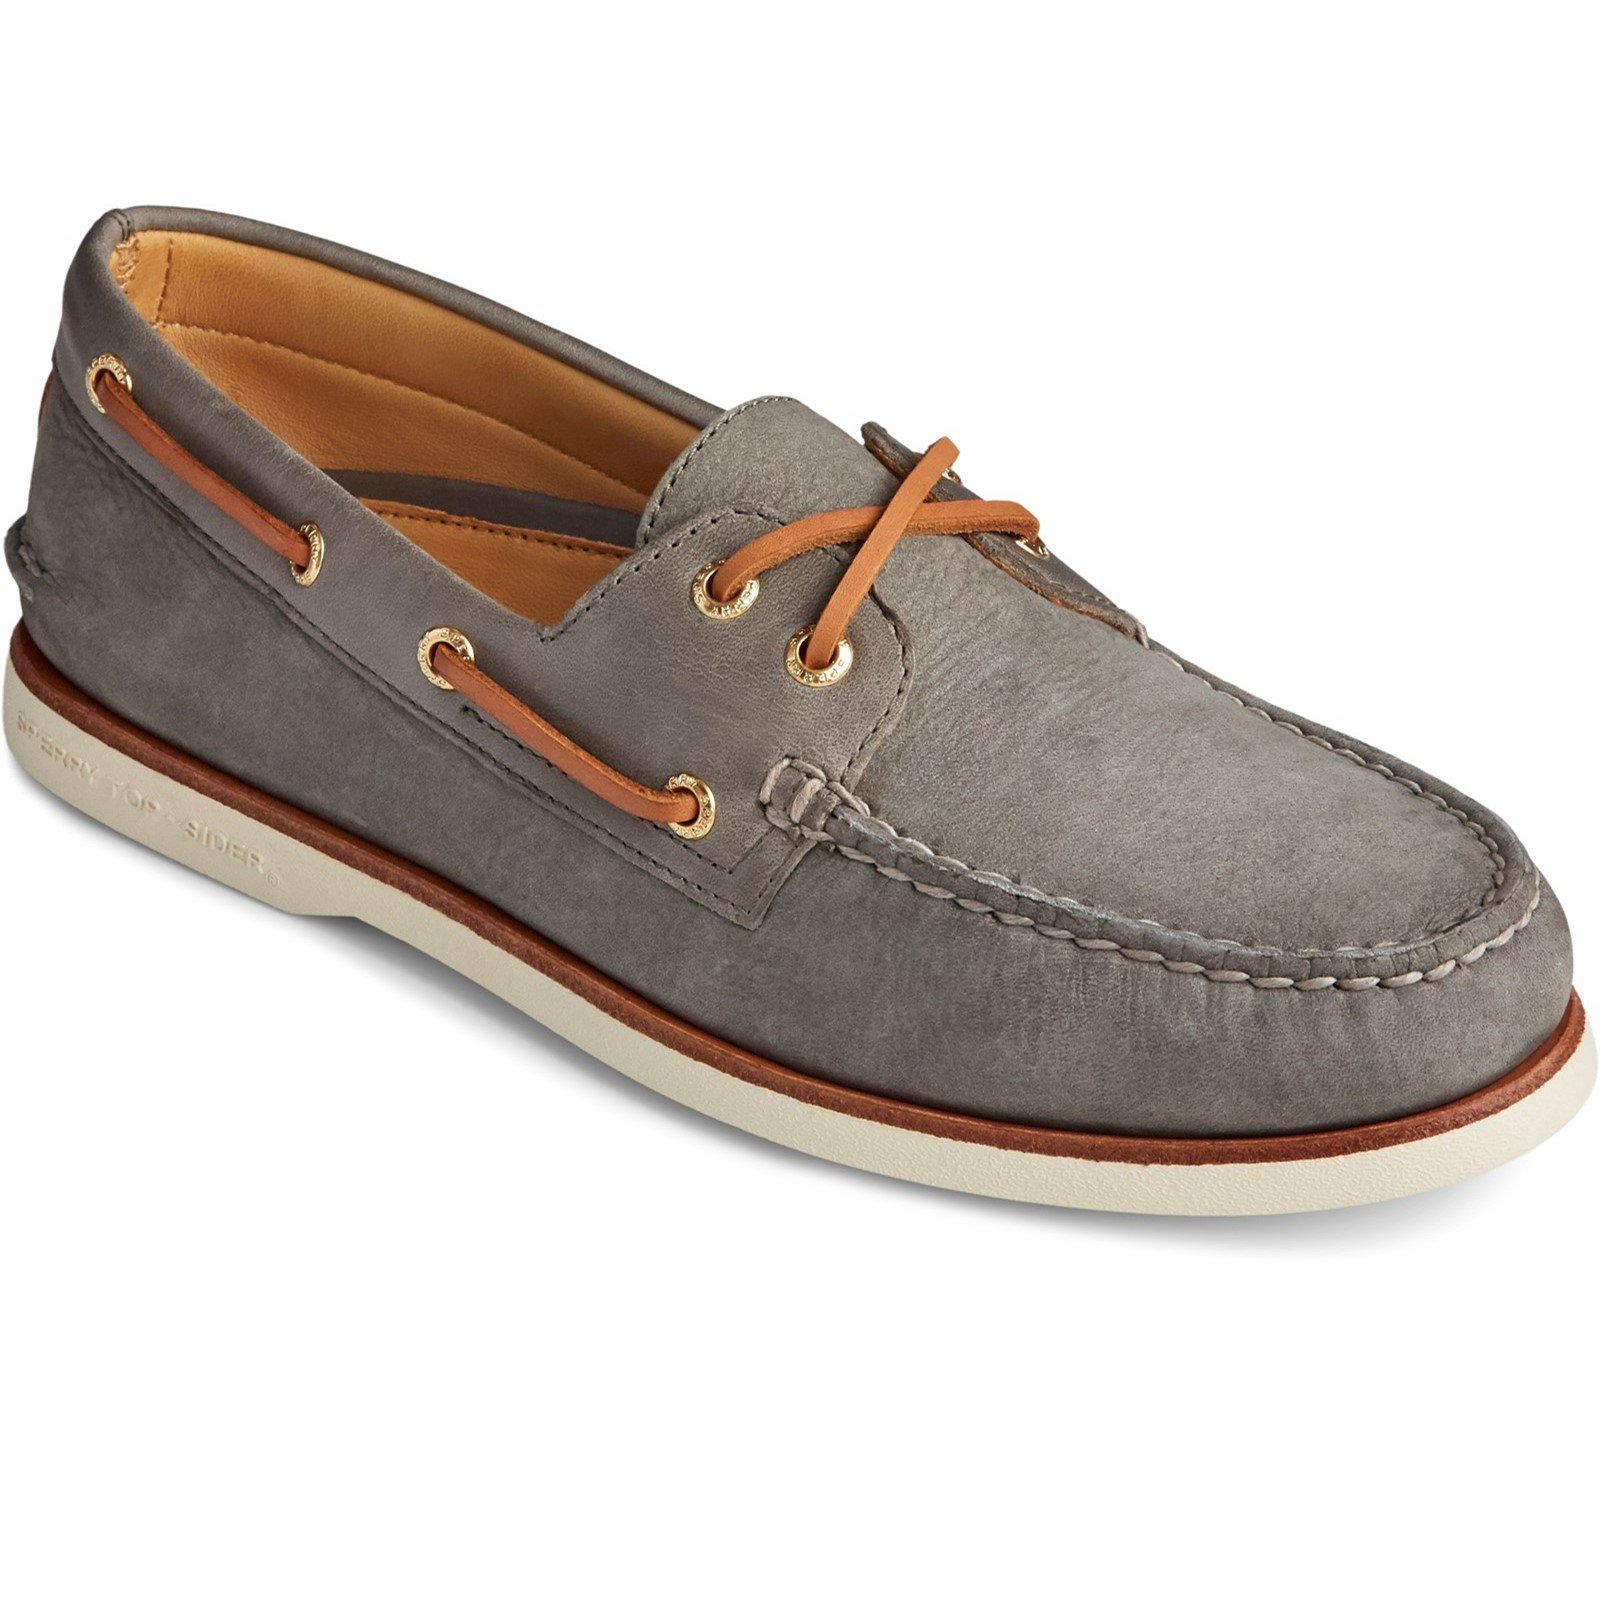 Sperry Men's Authentic Original Seaside Boat Shoe Grey 31529 - Grey 7